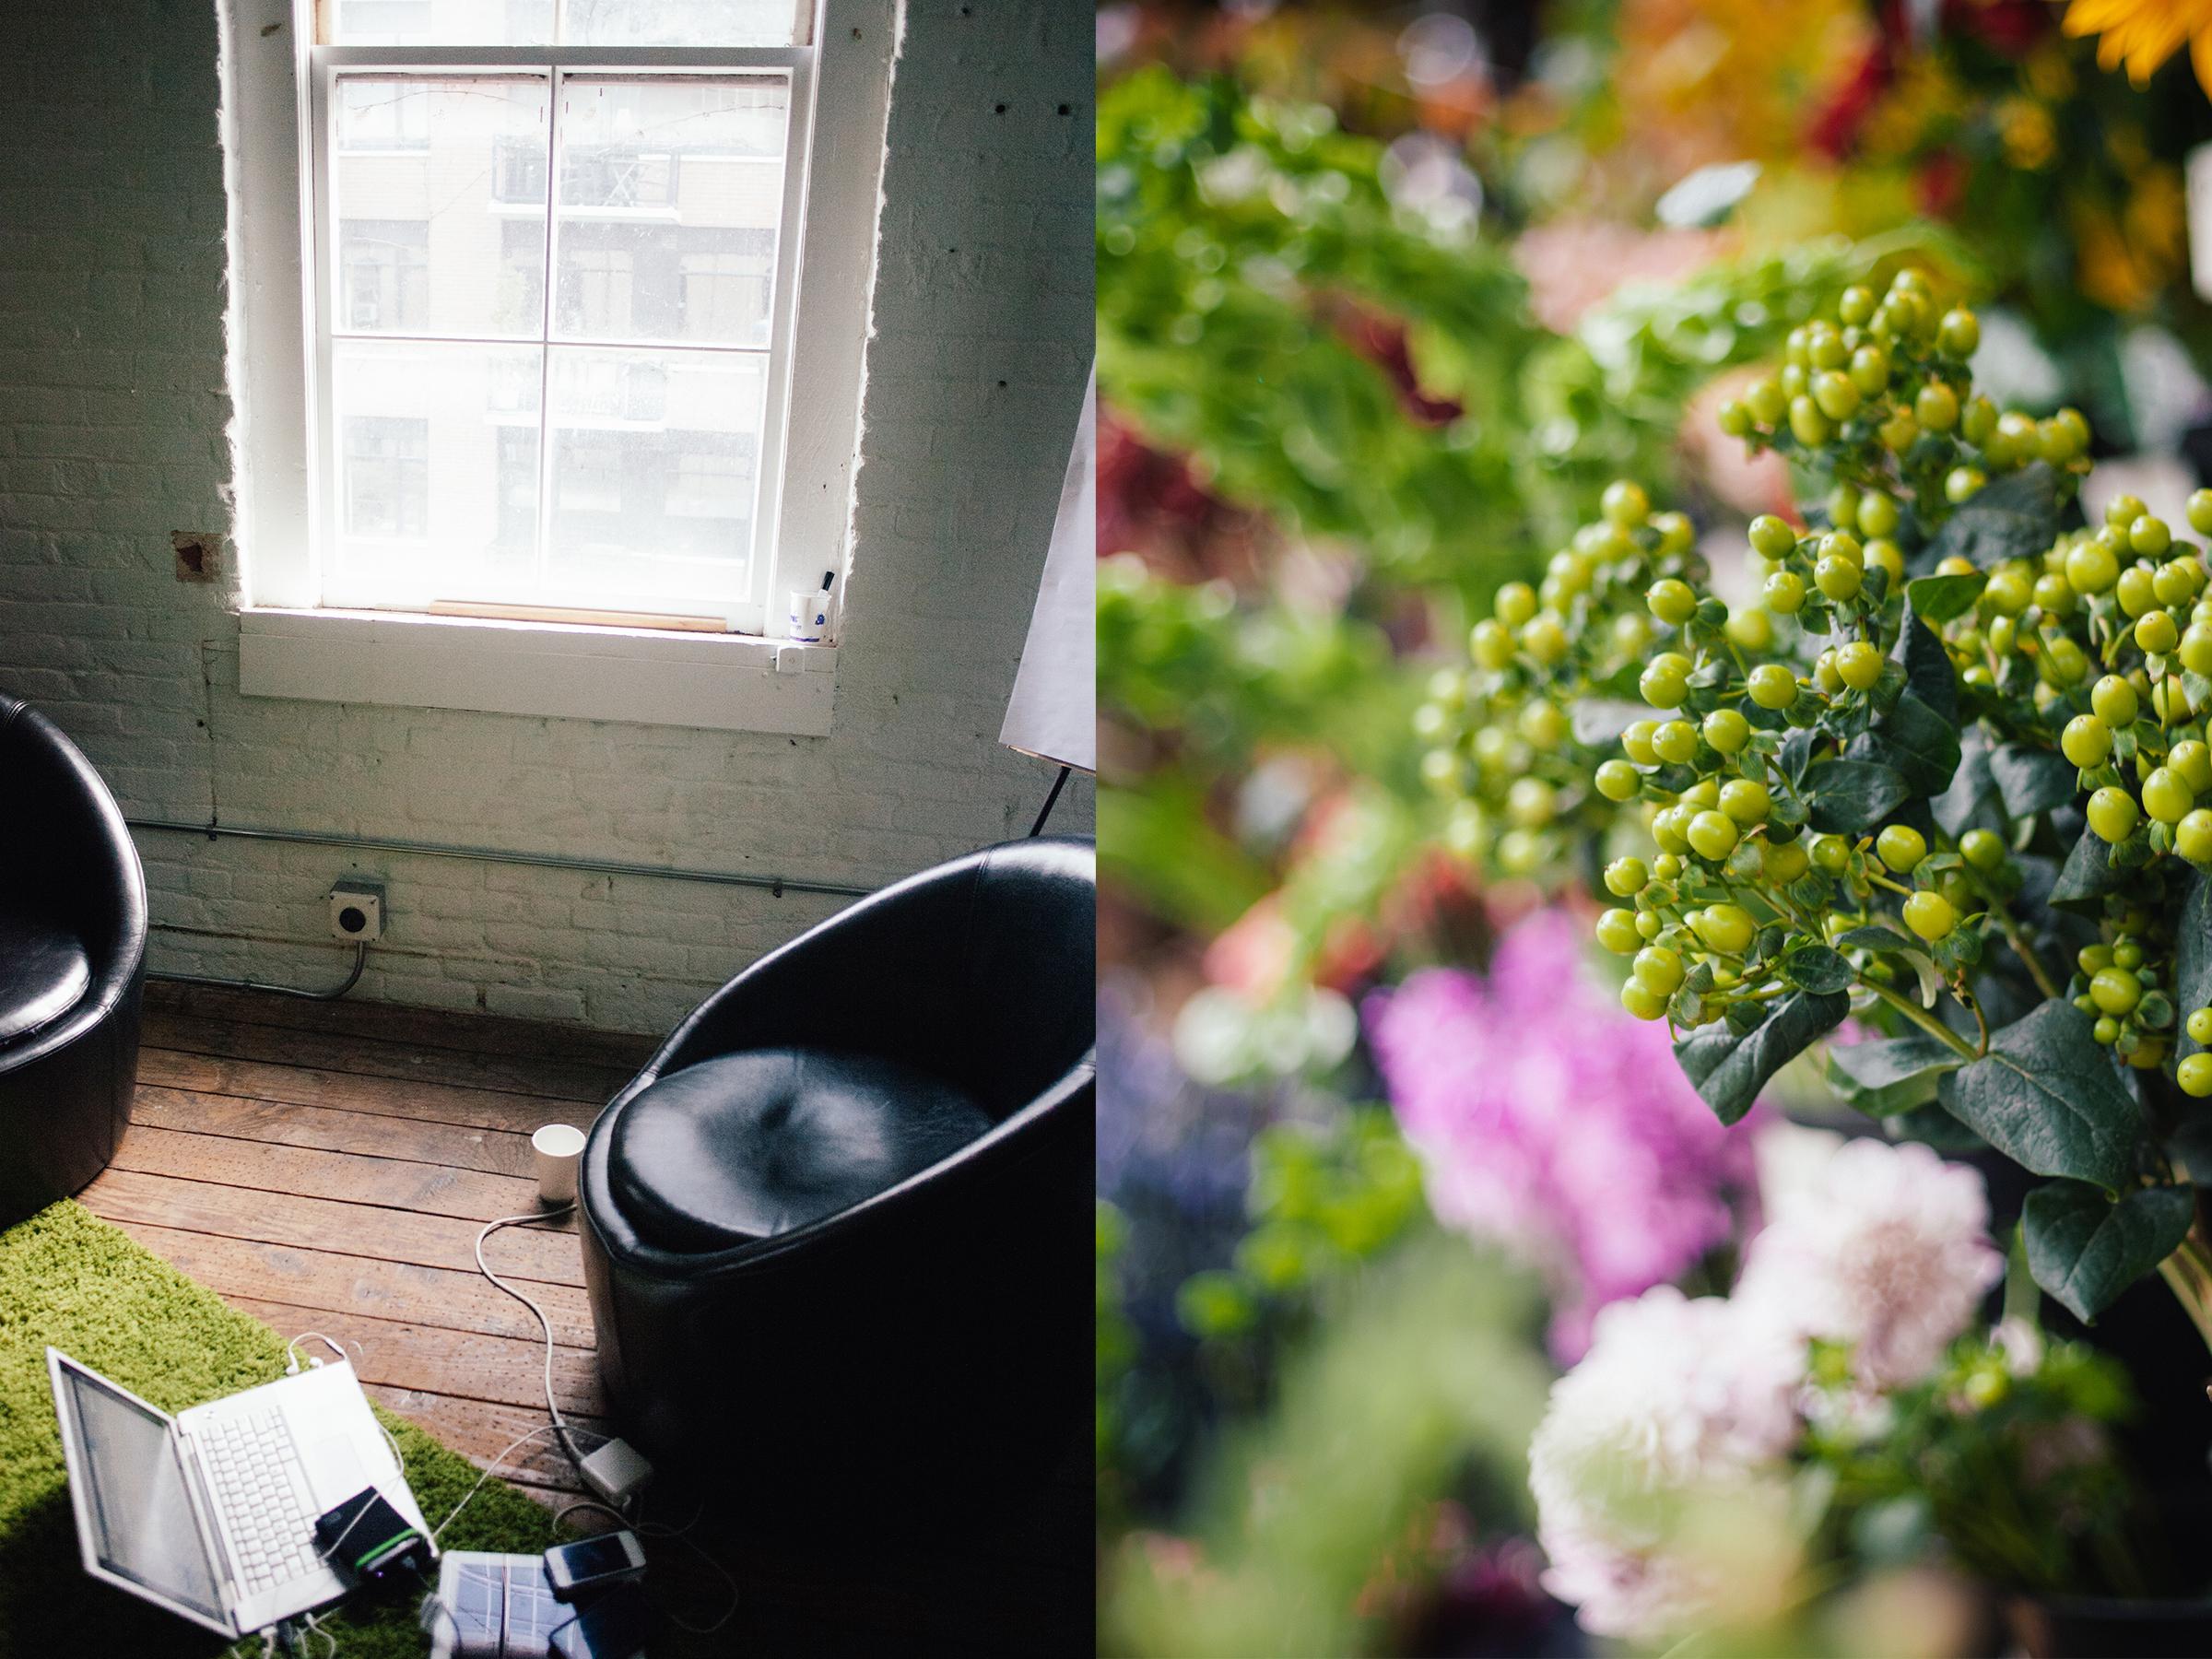 Choose growth blog - my workstation and portland